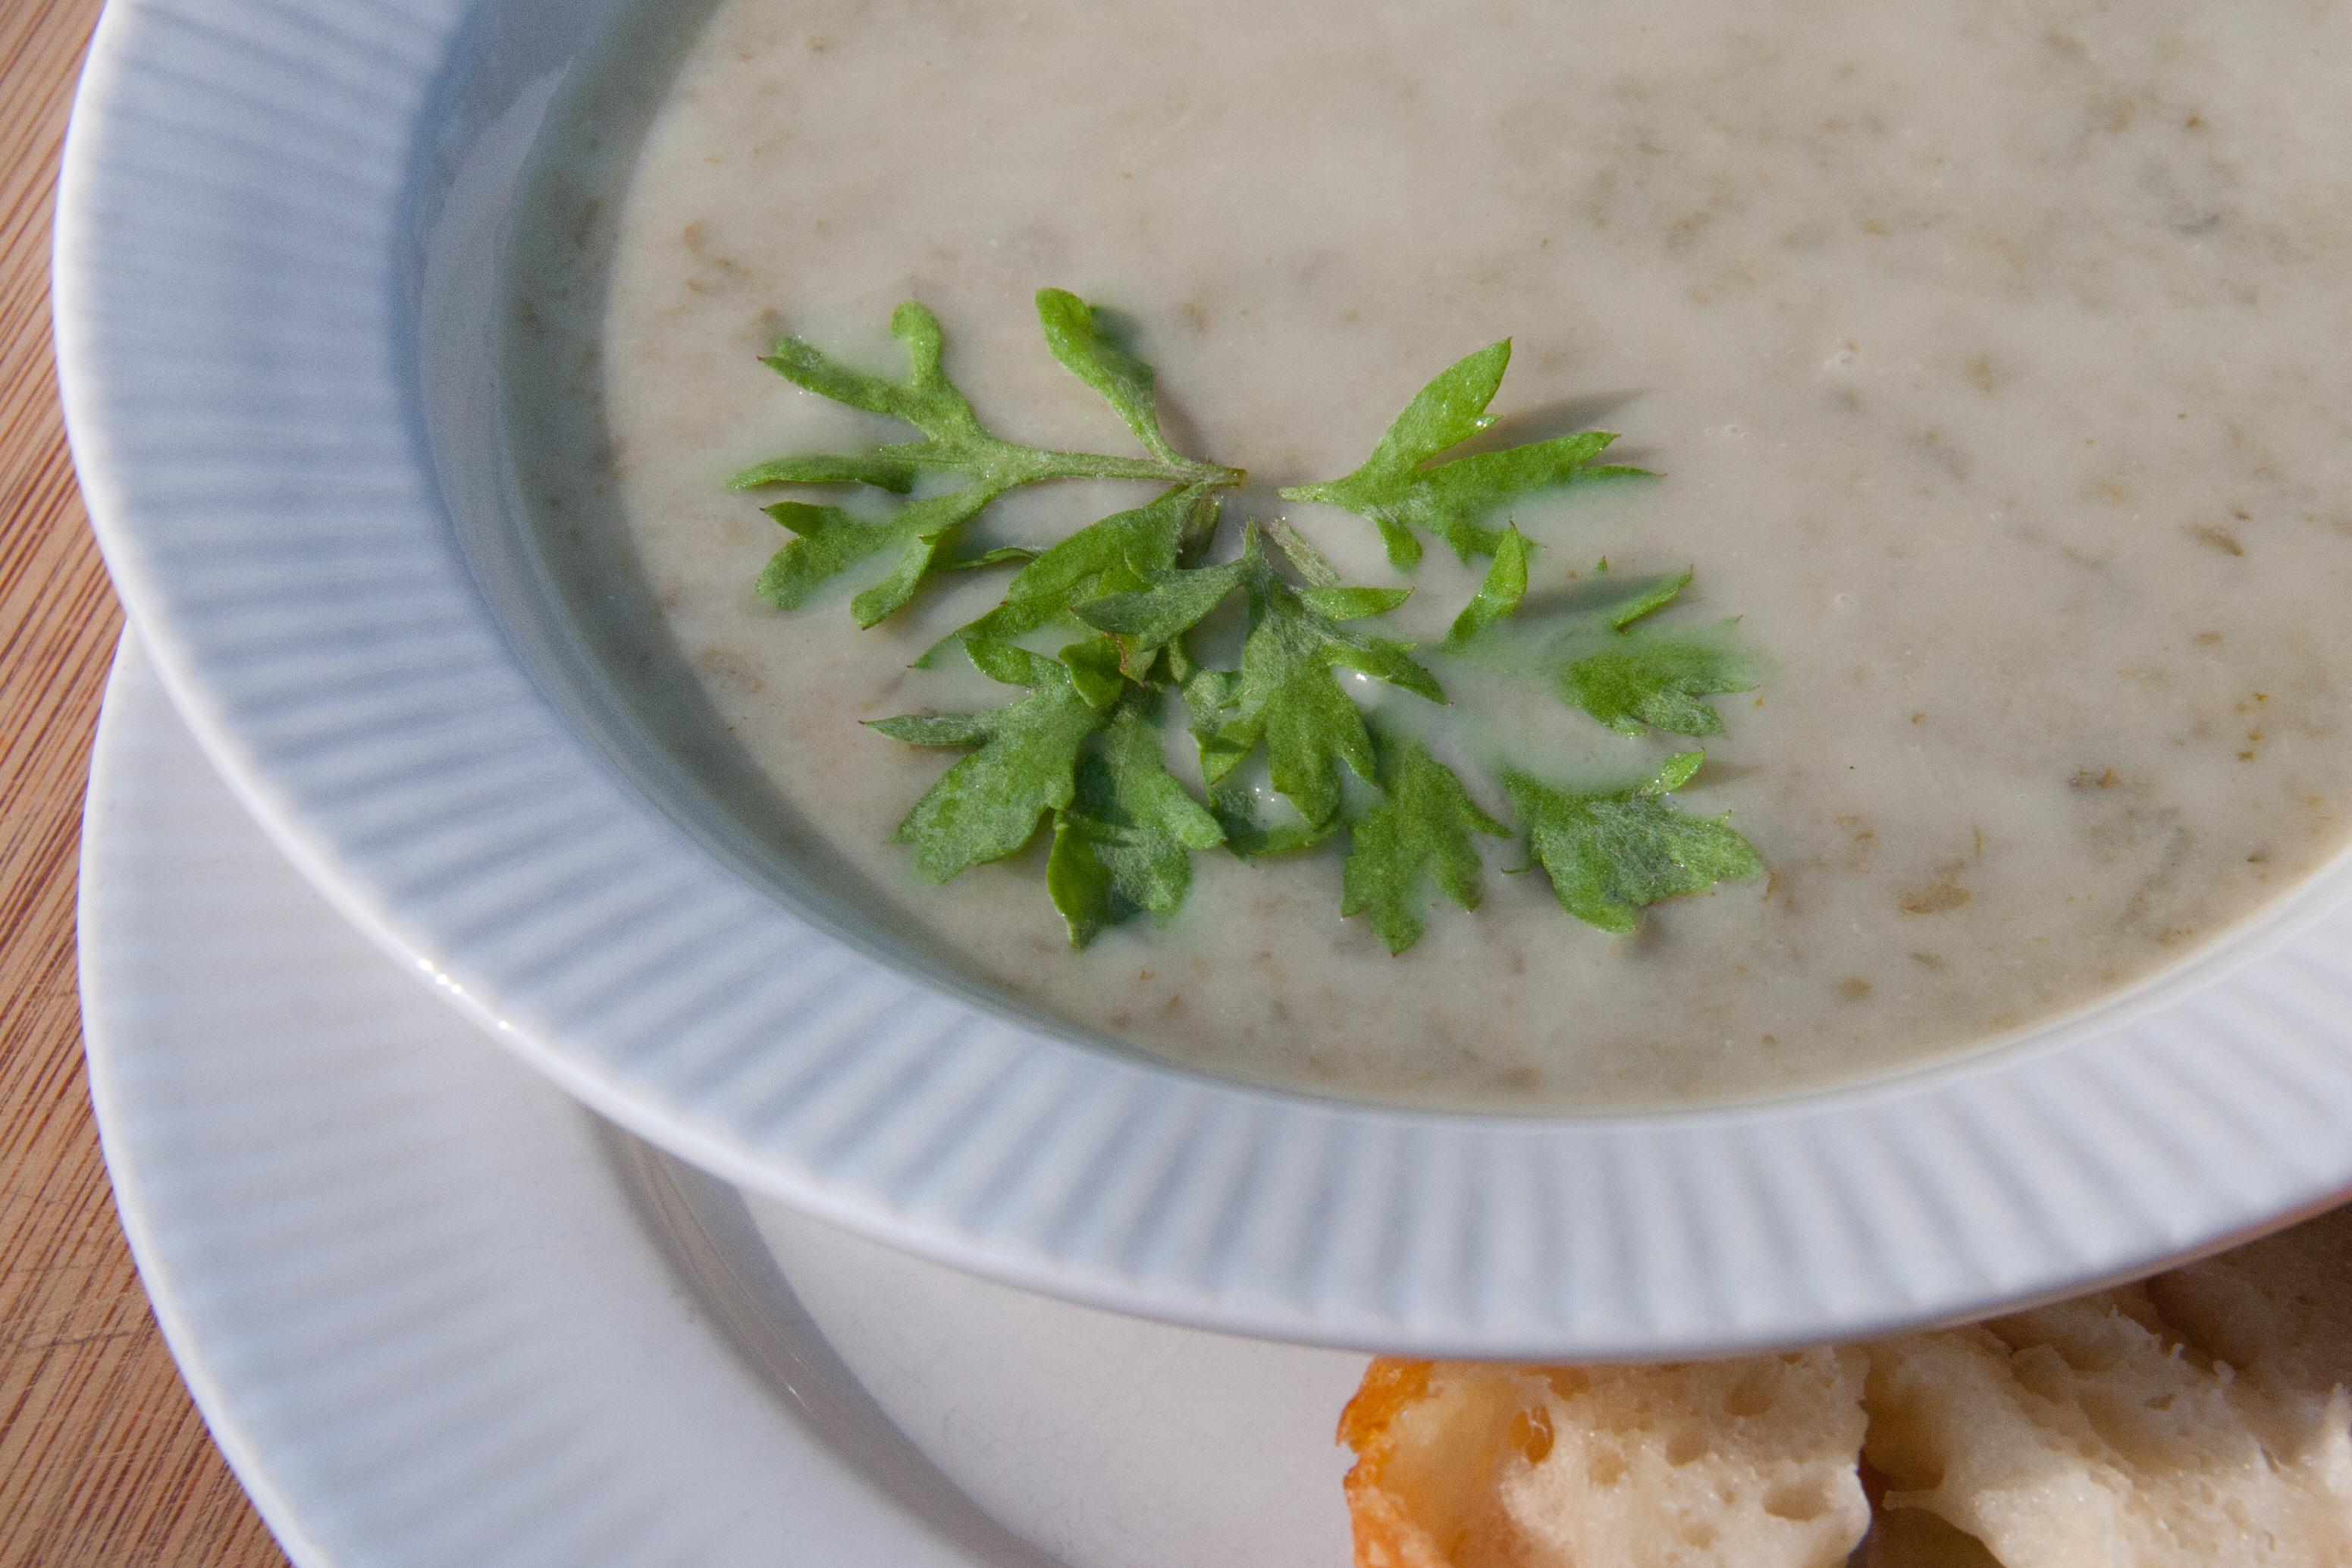 Mugwort Soup Recipe (Artemisia vulgaris)